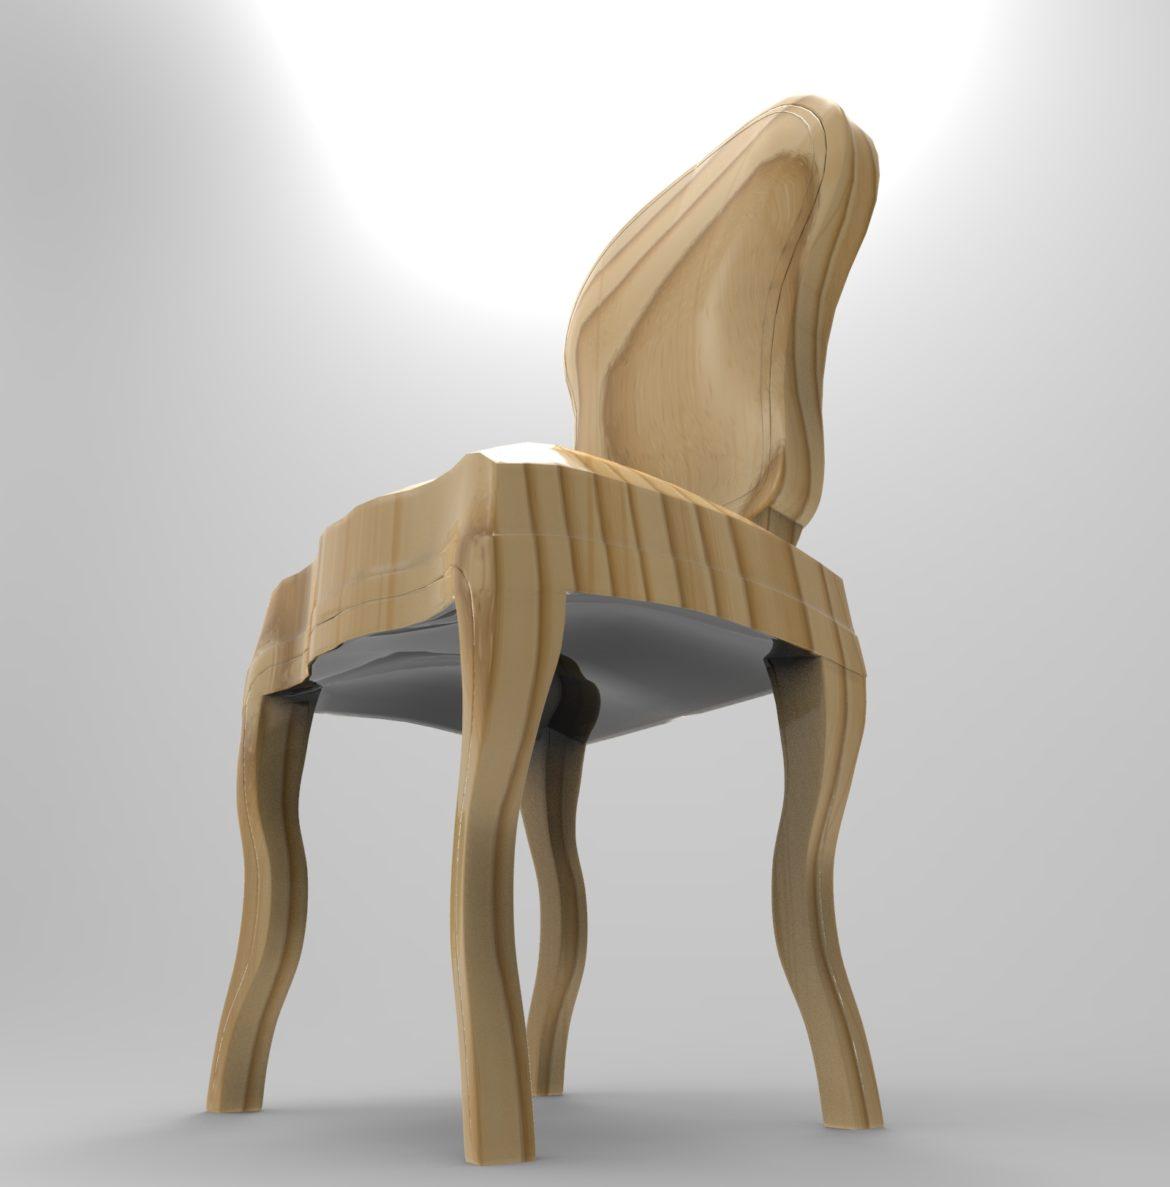 chair chapender-7 3d model max obj 295876